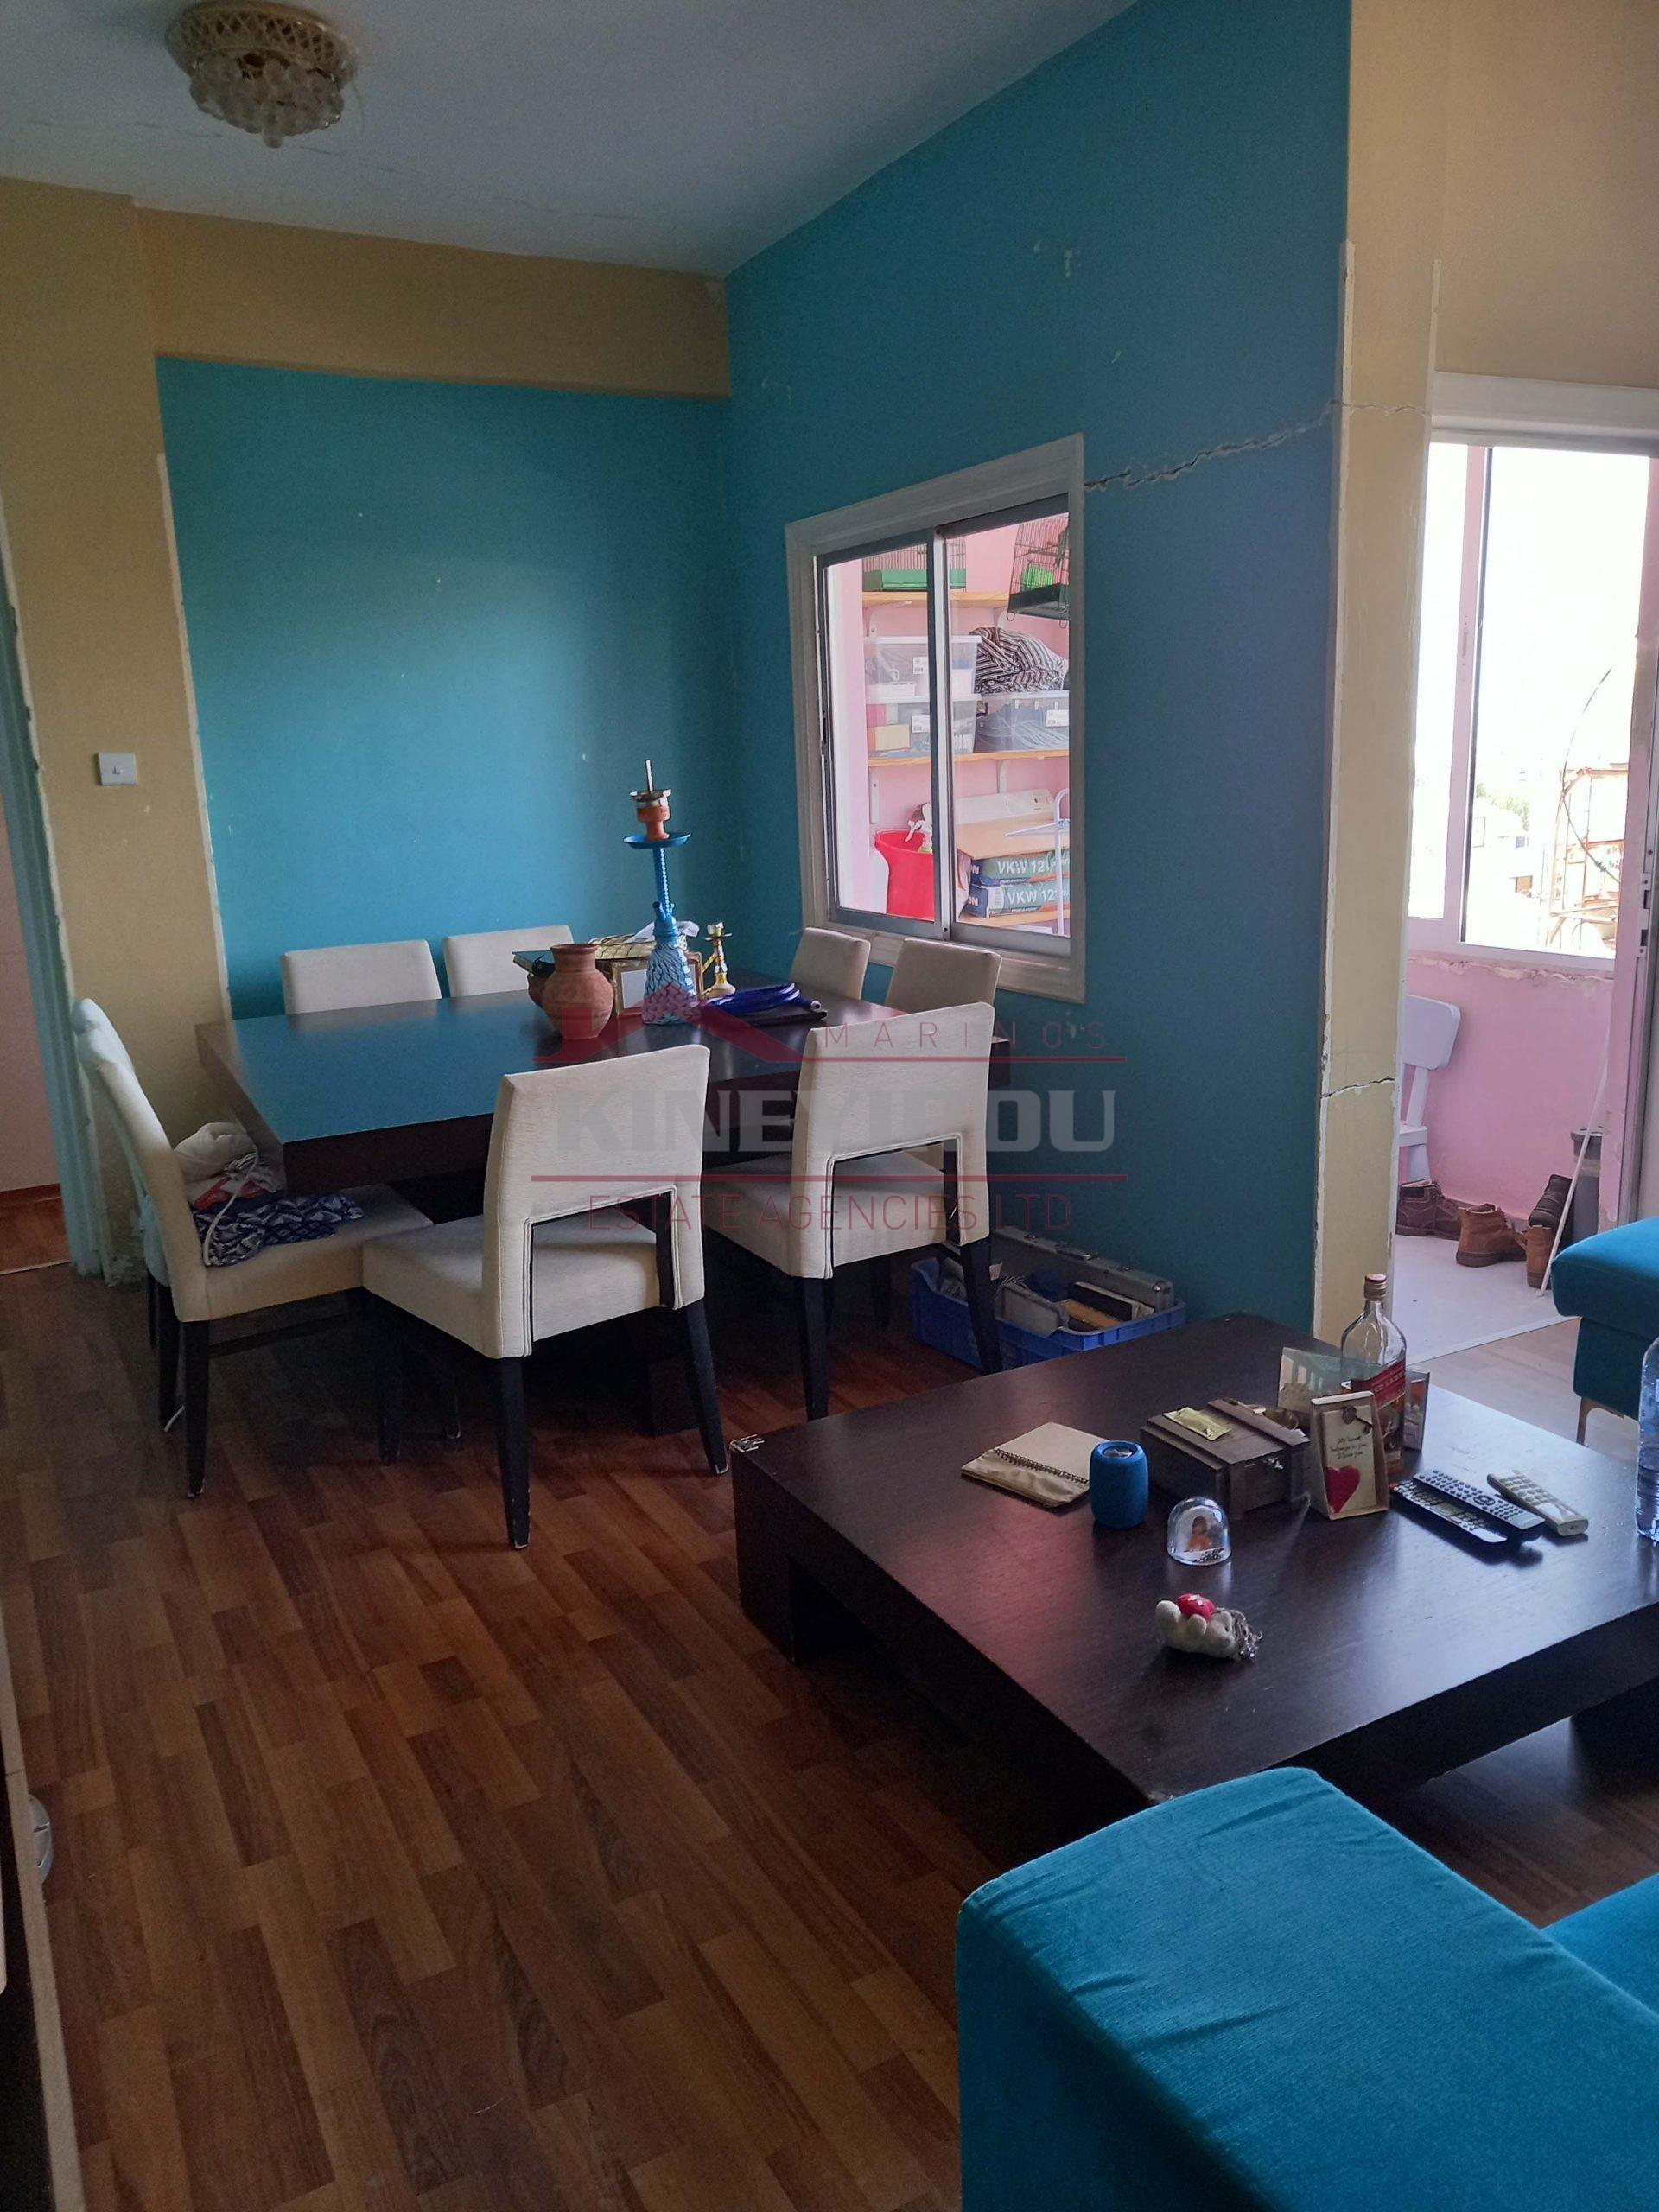 2 Bedroom Apartment in Faneromeni – Drosia area, Larnaca